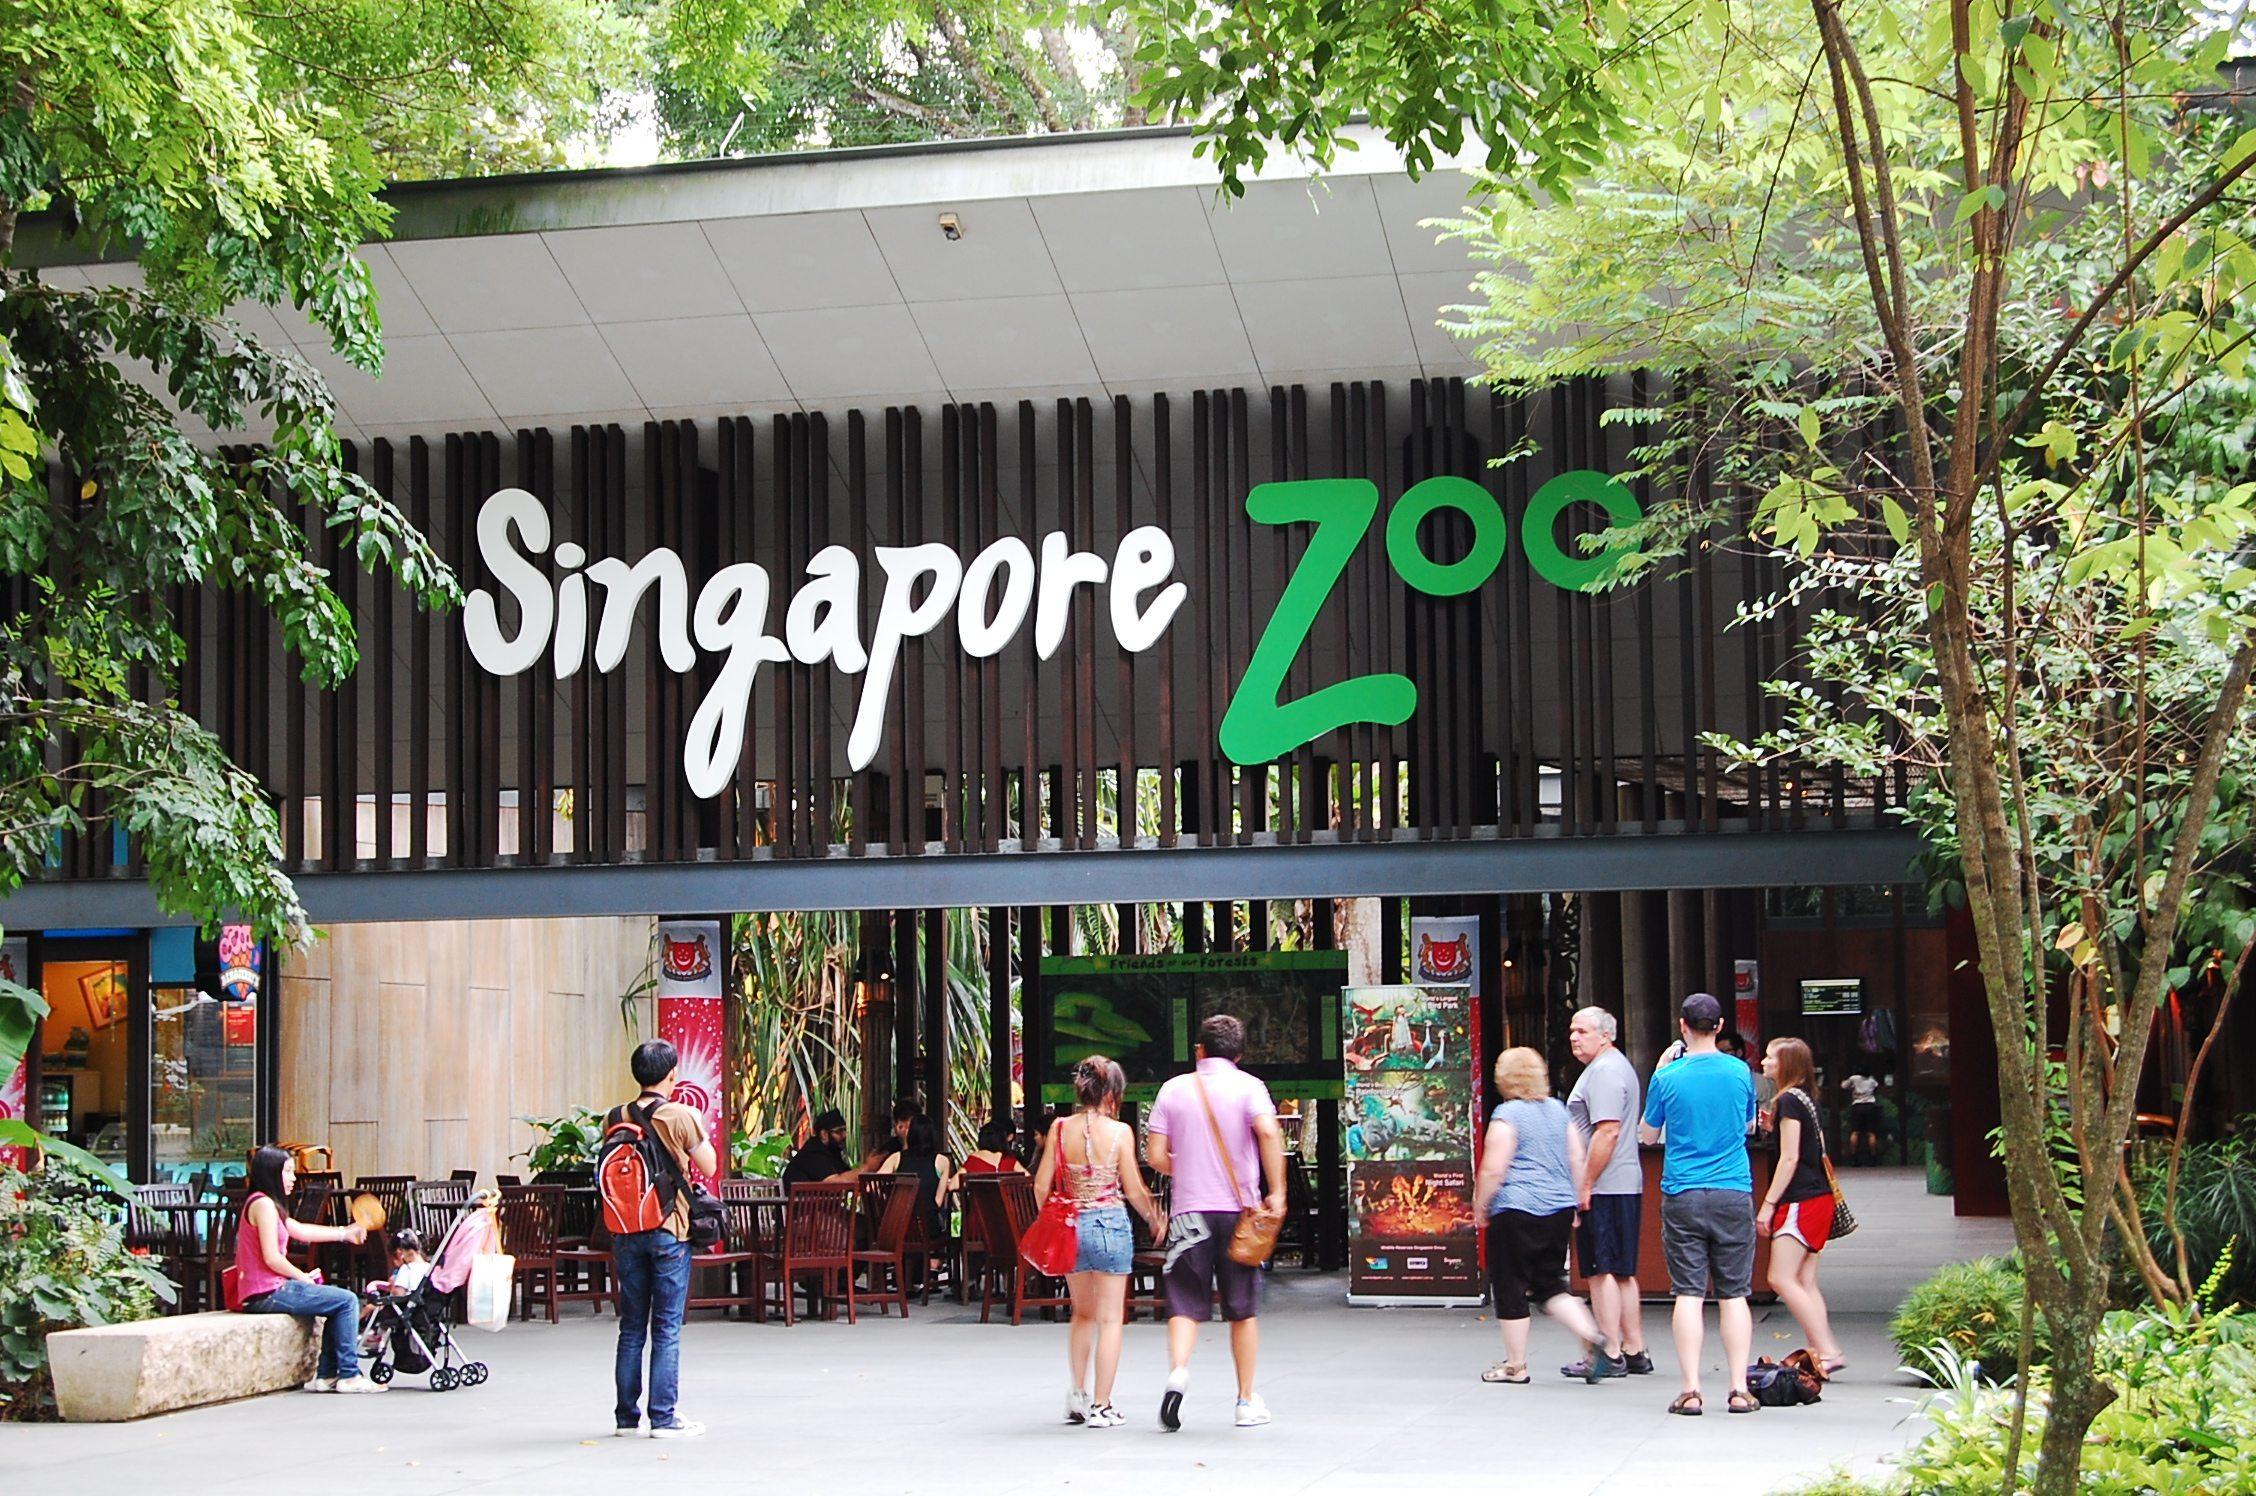 Singapur Hayvanat Bahçesi'nde en iyi 10 aktiviteleri